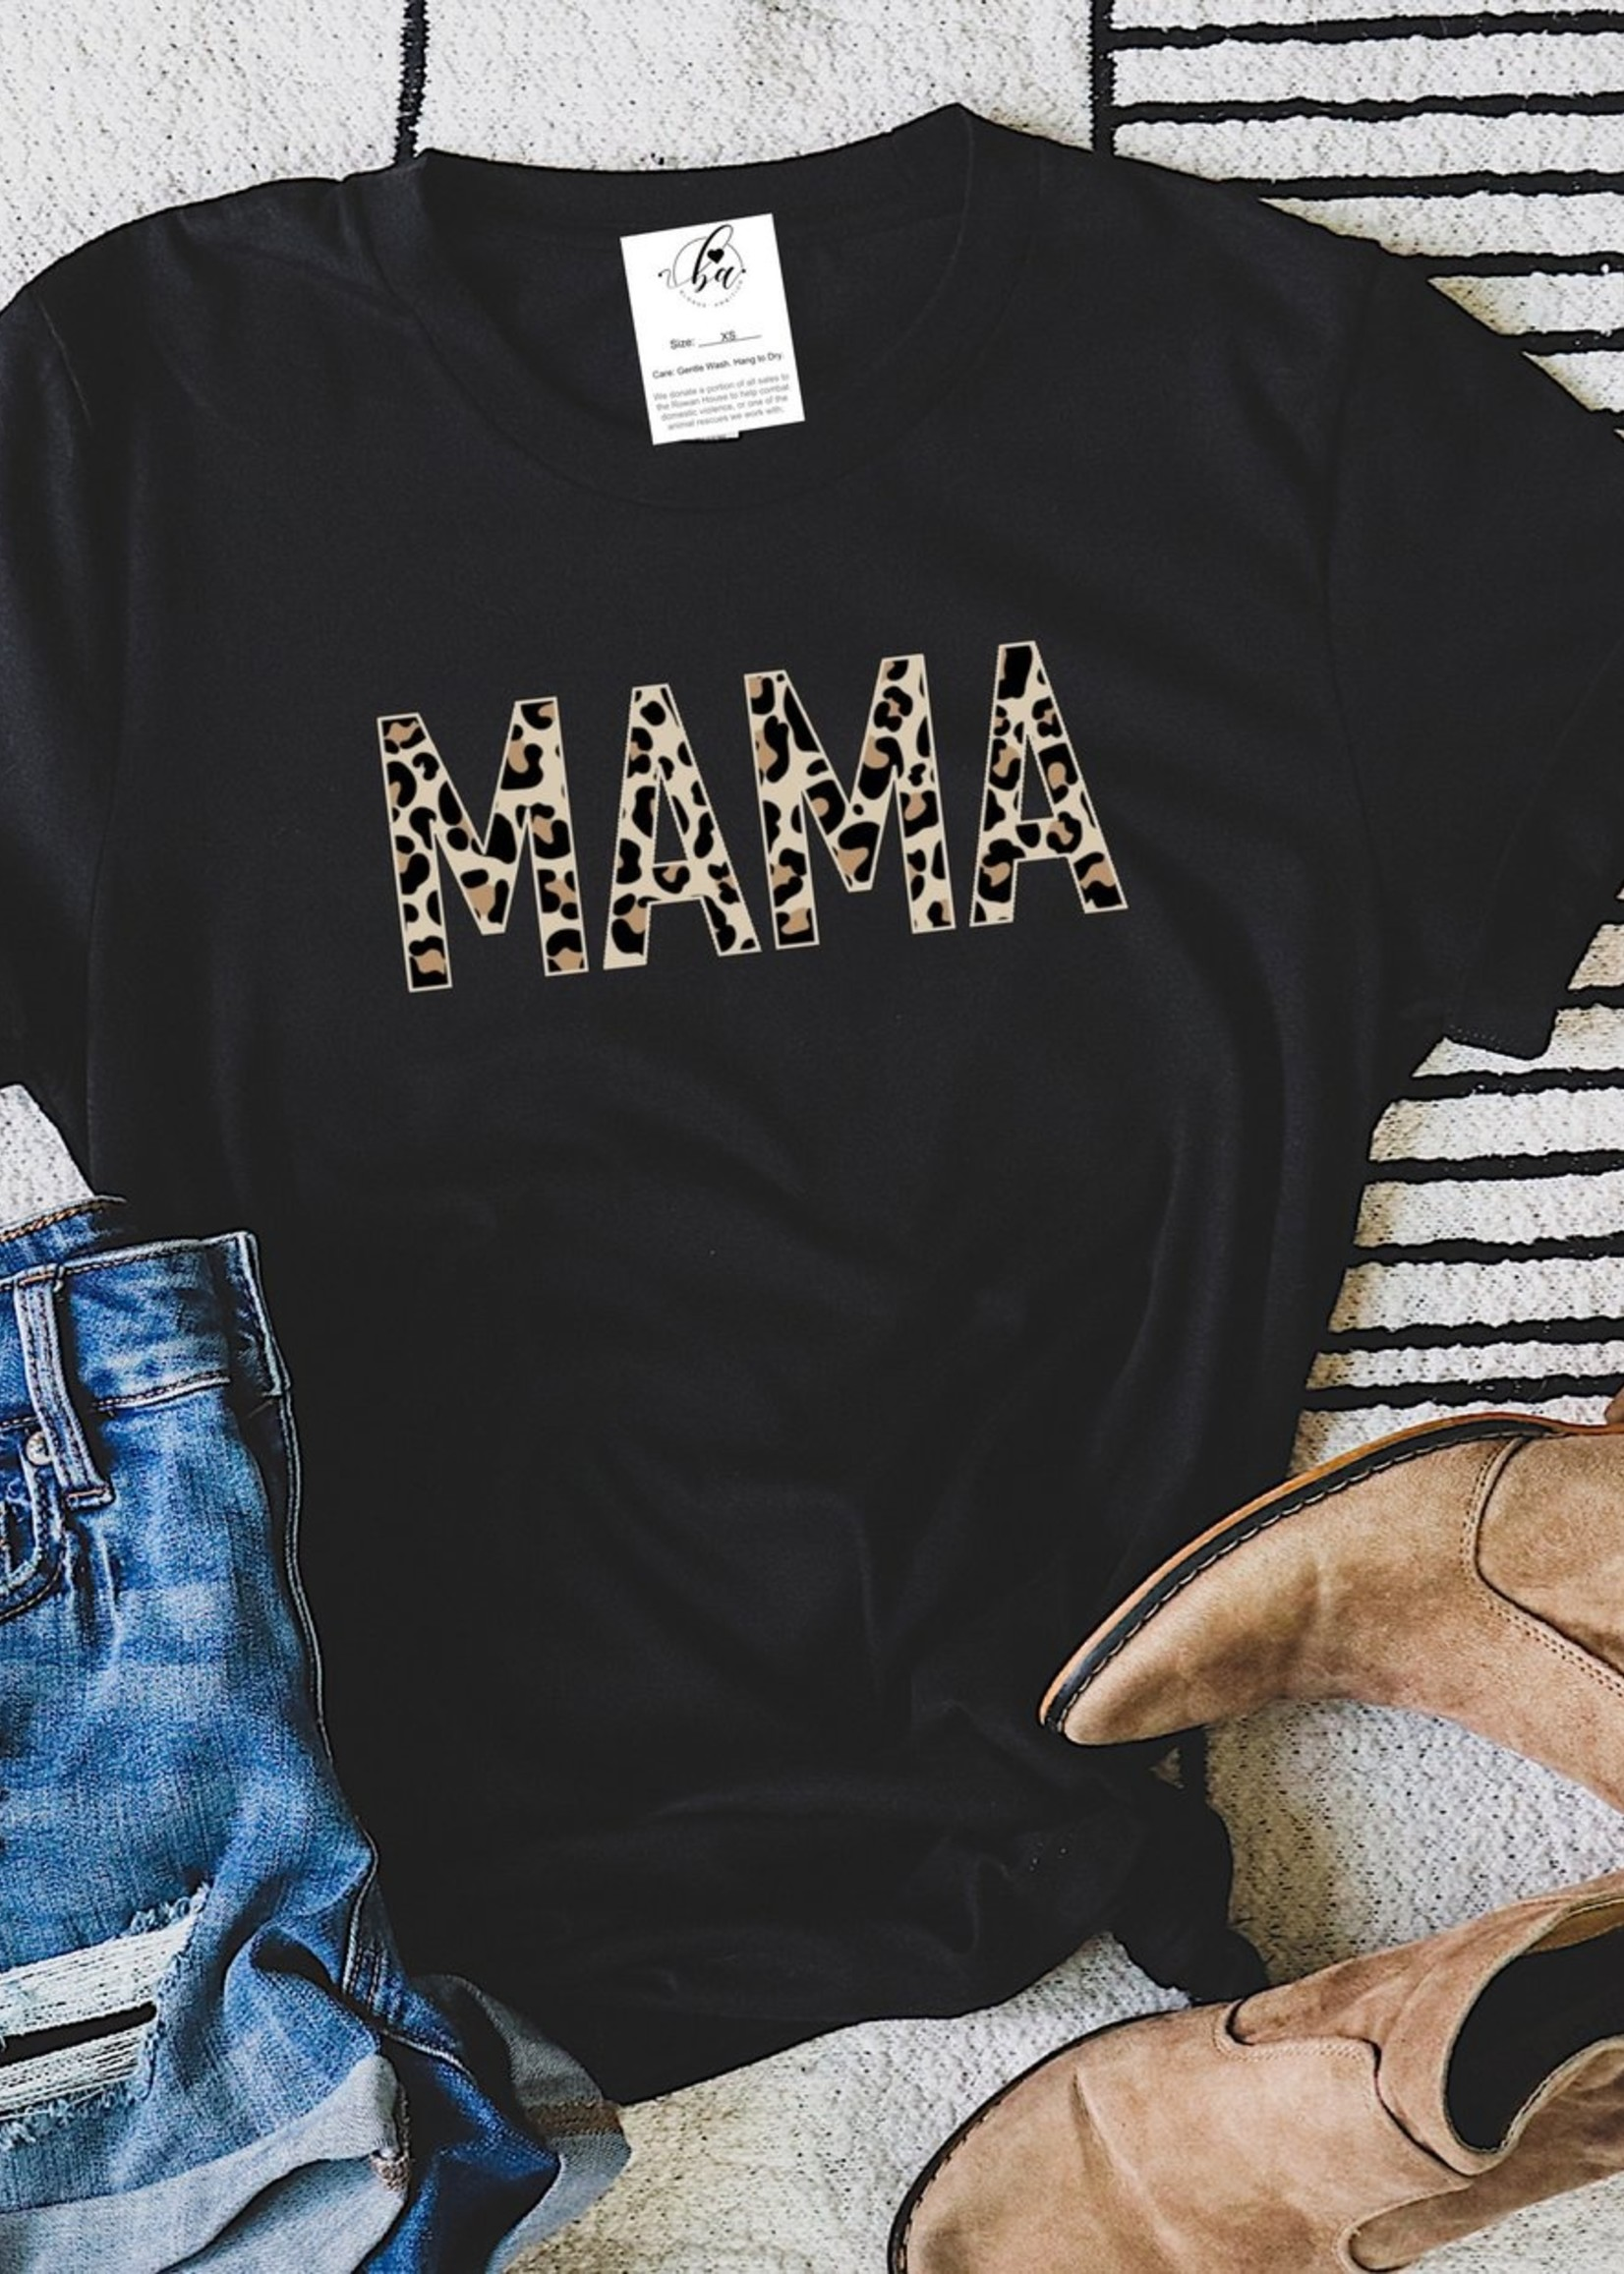 Blonde Ambition Leopard Mama T-Shirt